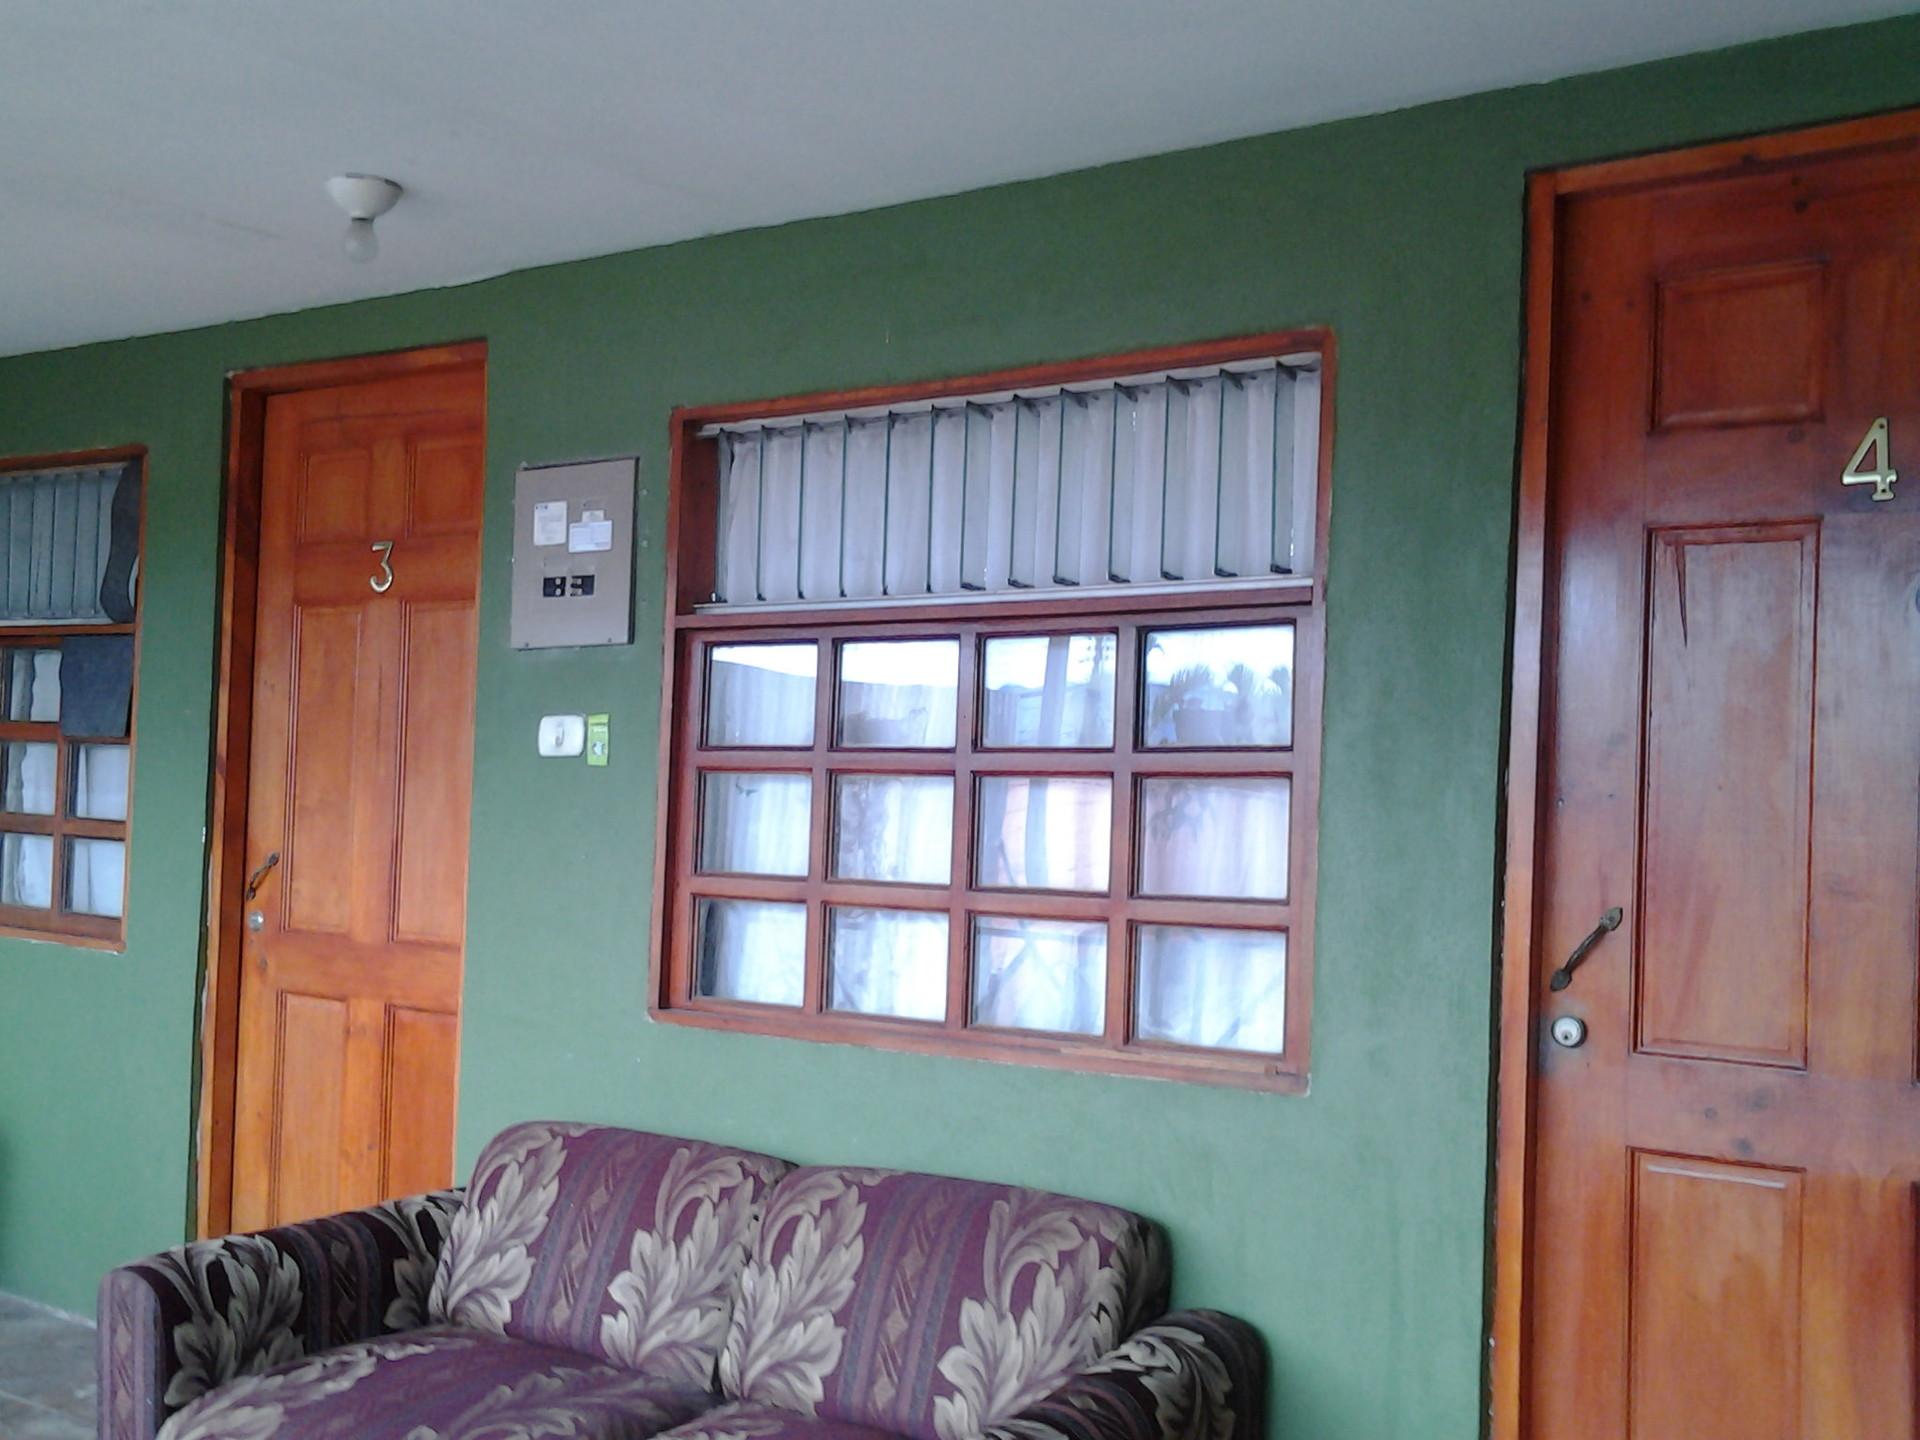 habitaciones-privadas-estudiantes-extrangeros-38b11ee6c5a38ca78cc36b8c39b1c358